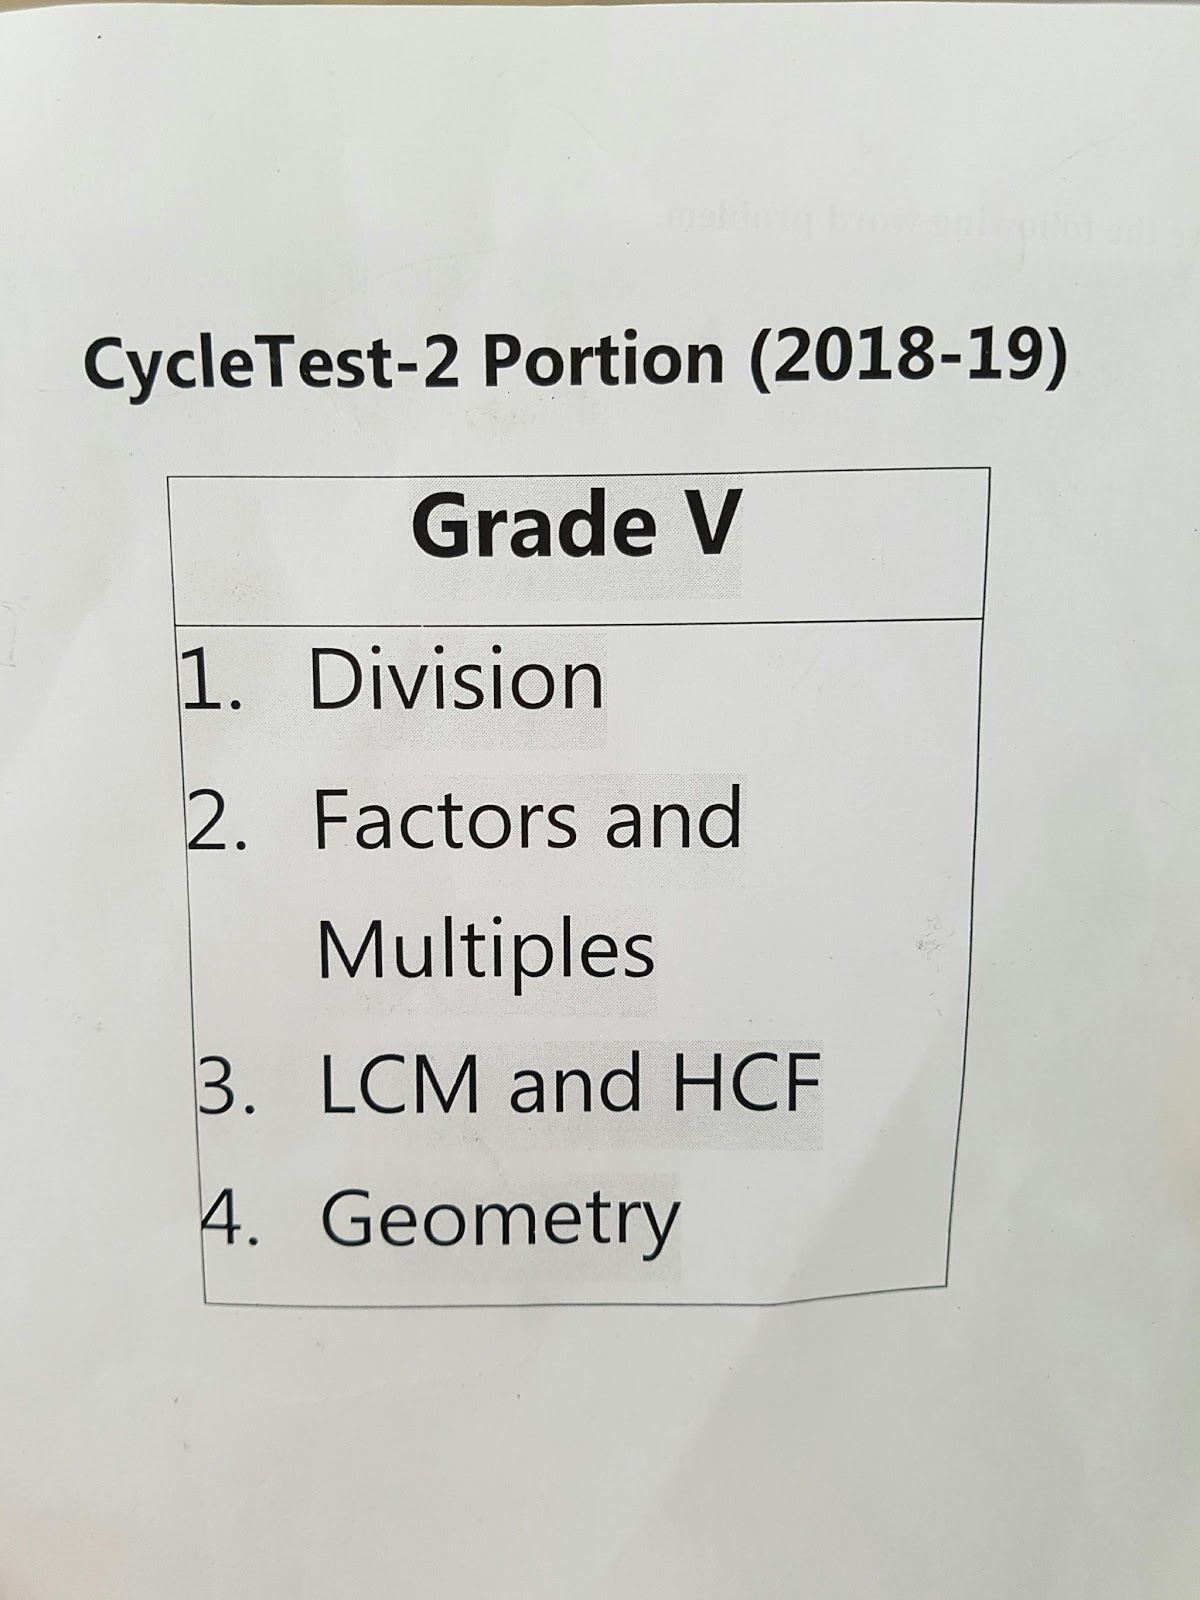 Grade 5- Maths - Cycle test 2 syllabus